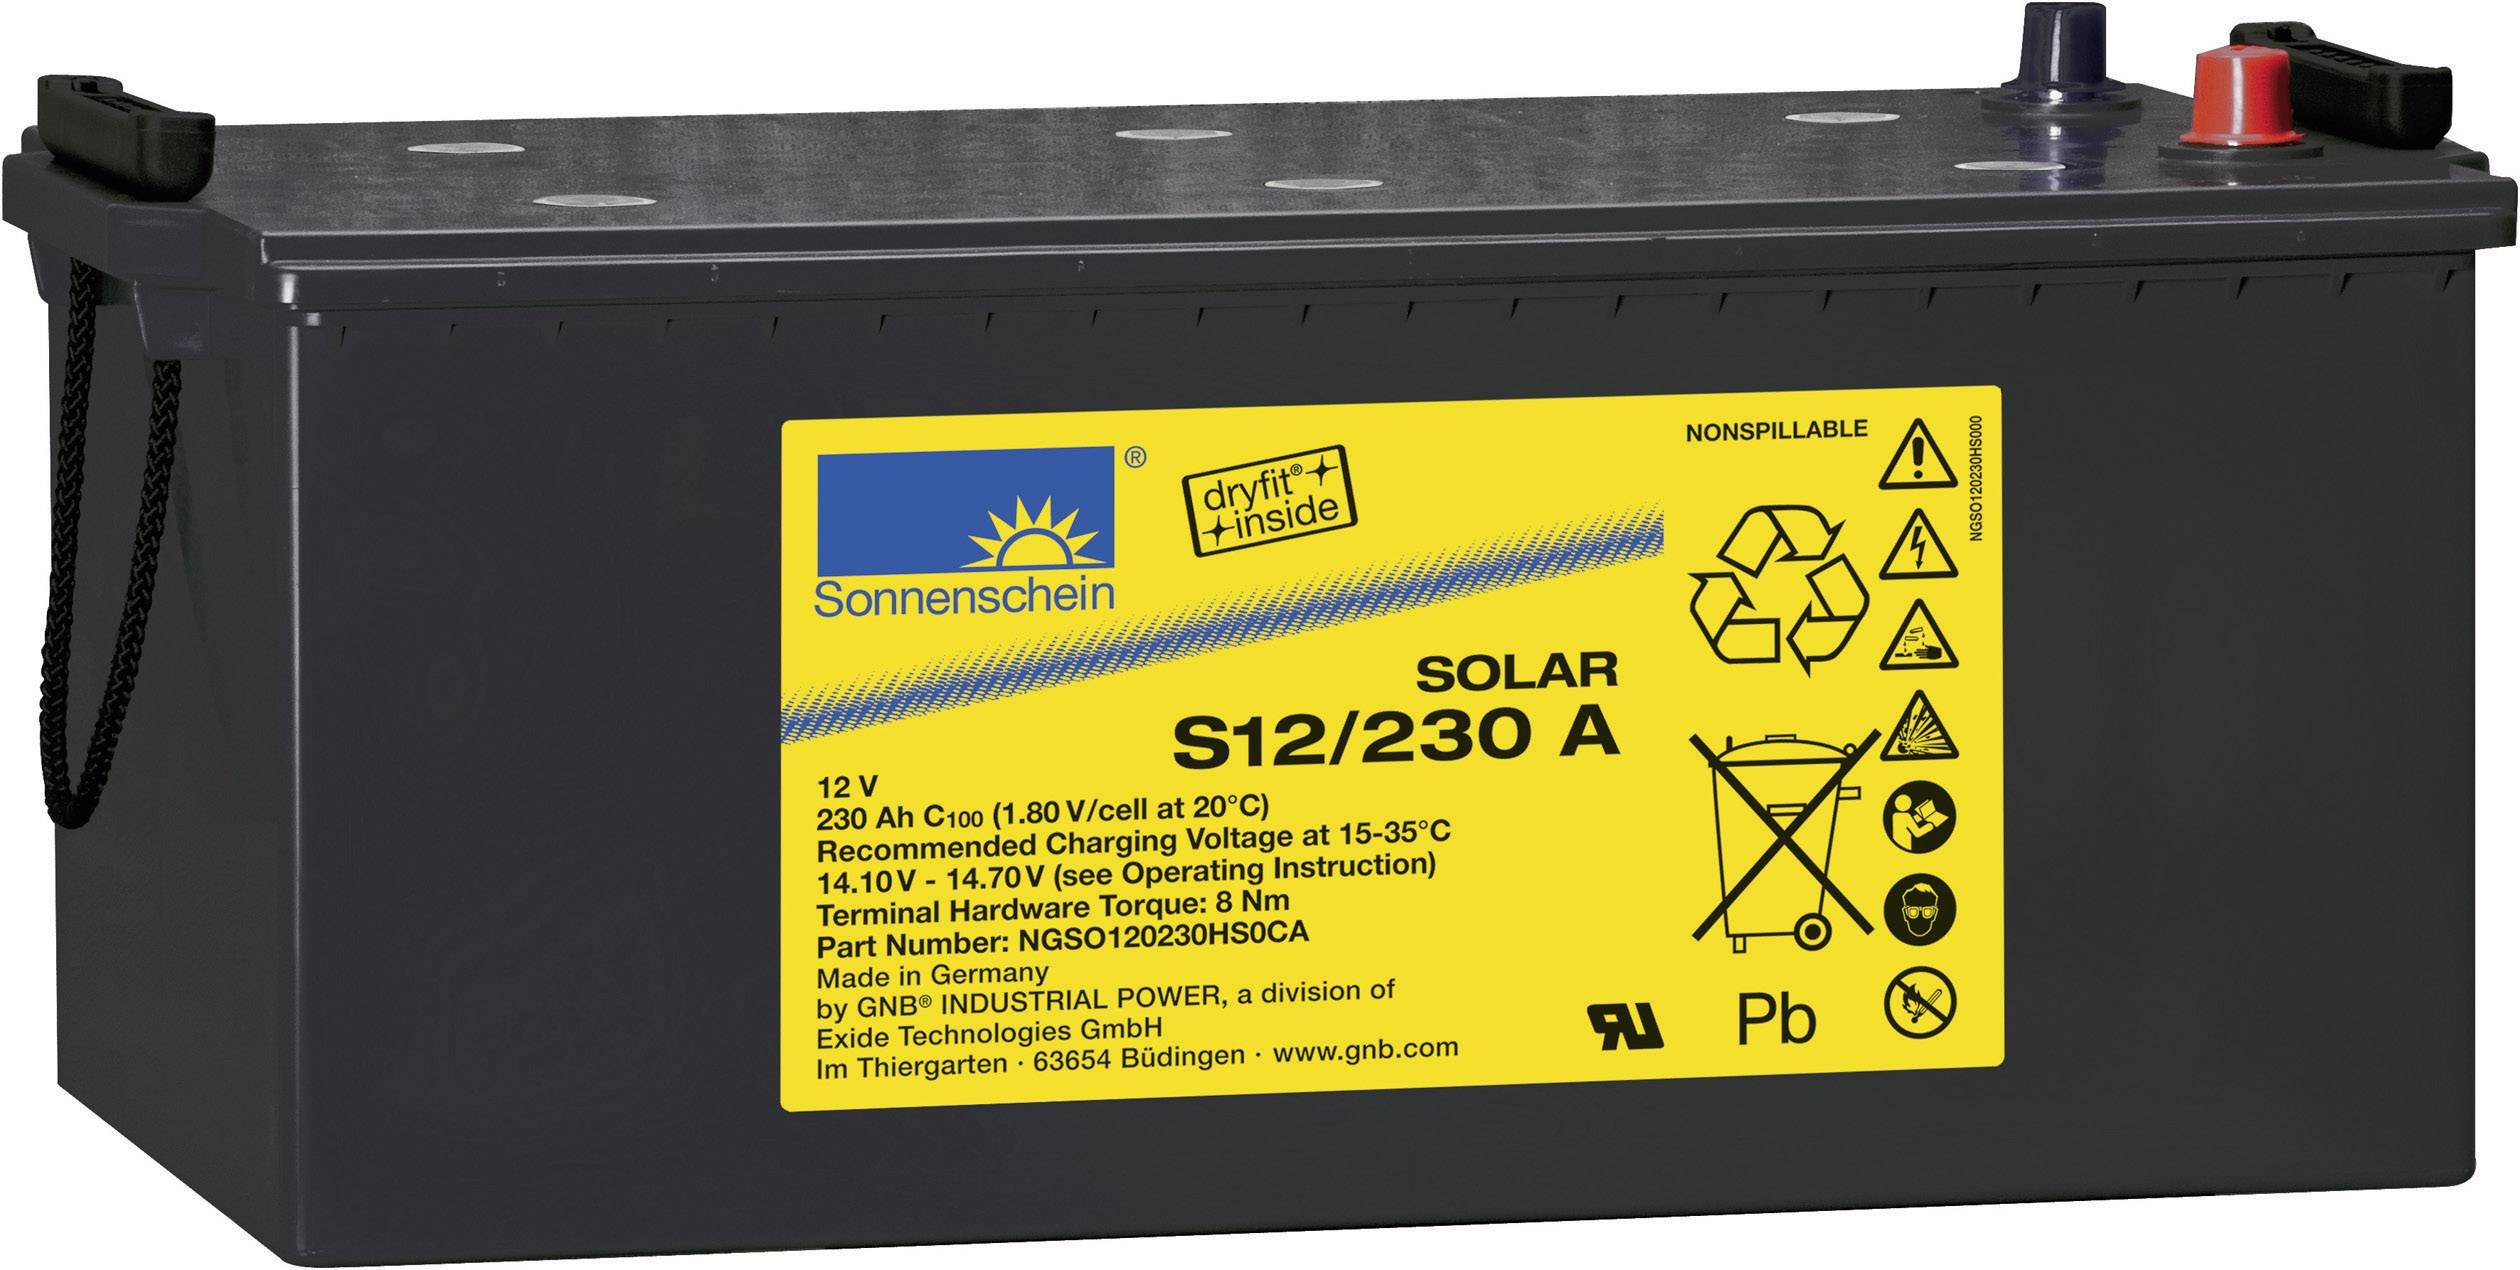 Solárny akumulátor GNB Sonnenschein S12/230 A S12/230 A, 12 V, 230 Ah